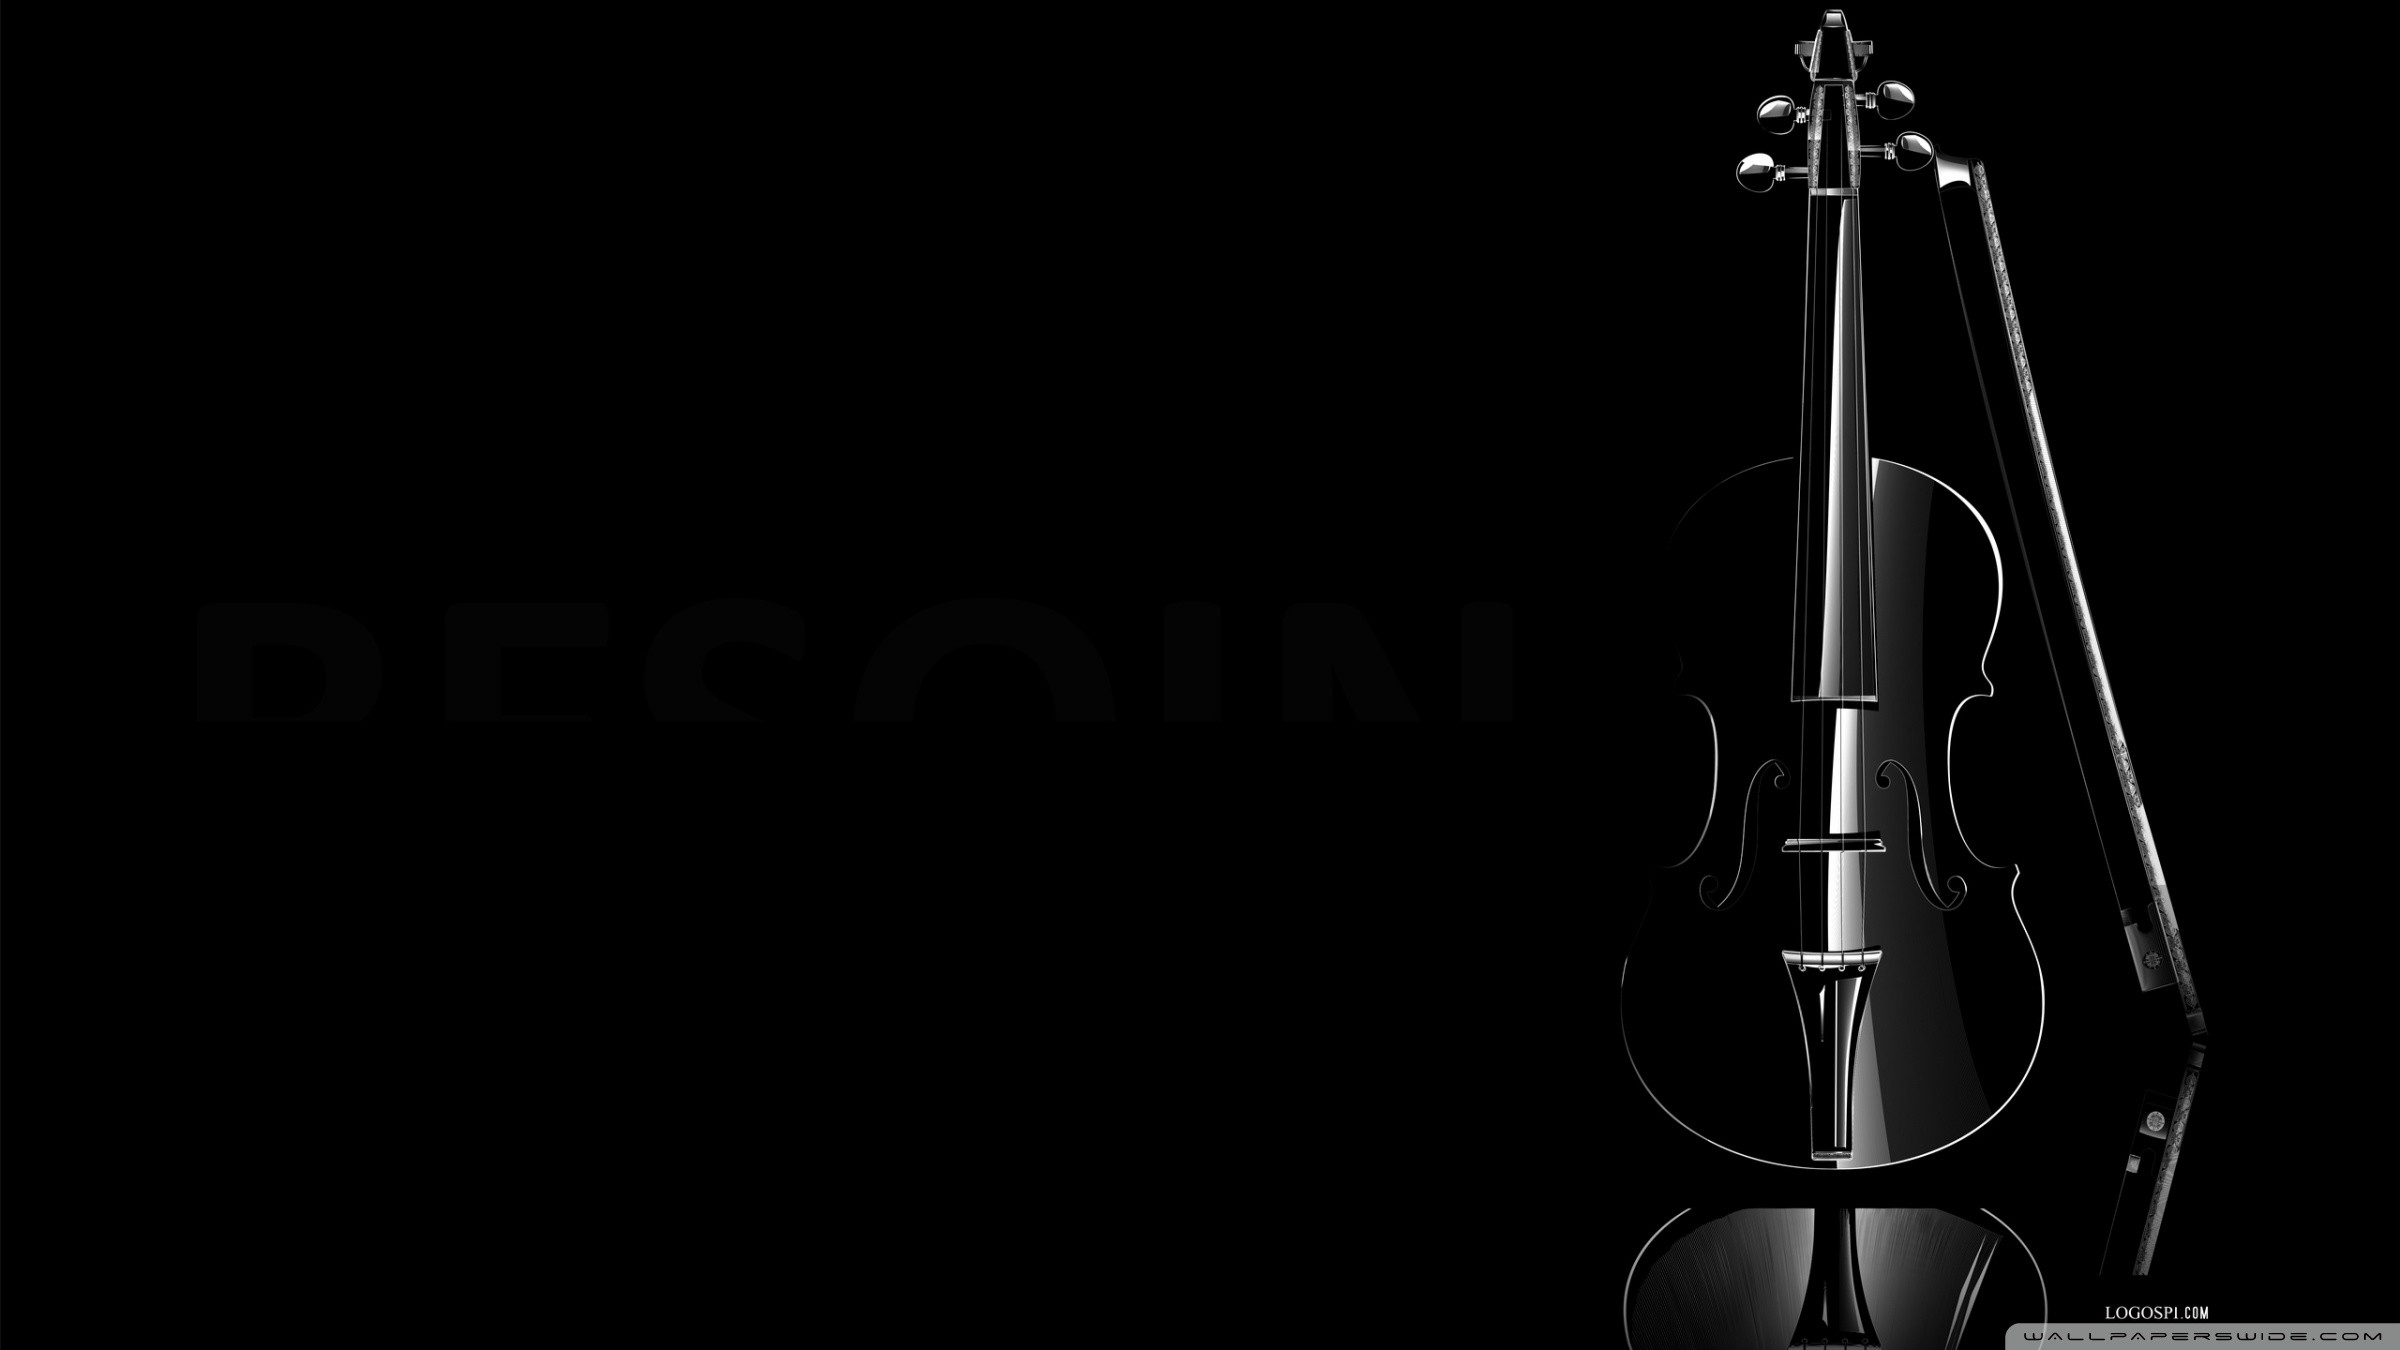 Black Violin HD desktop wallpaper High Definition Fullscreen